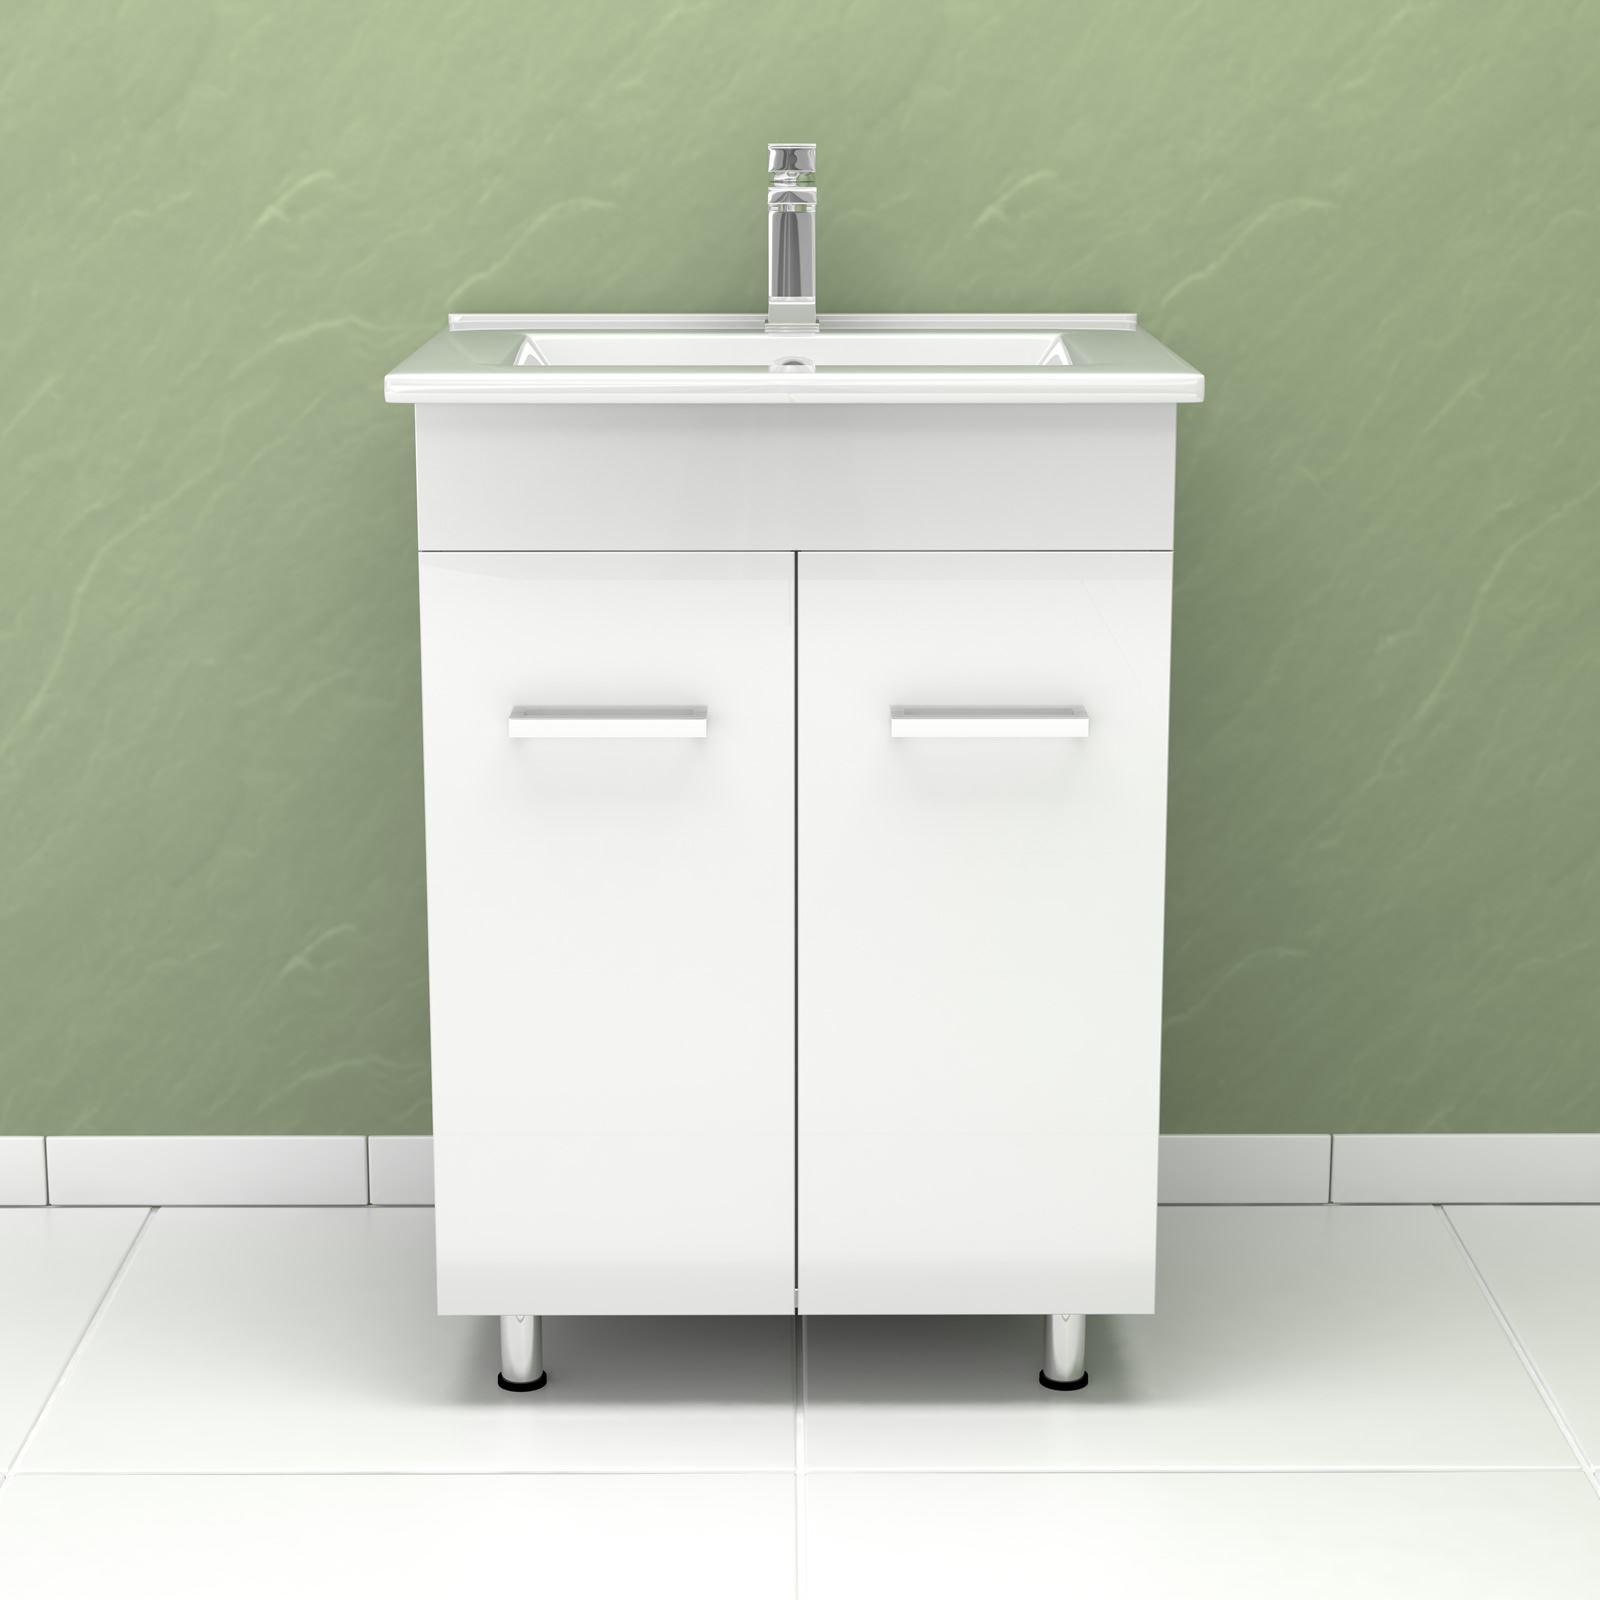 New Bathroom Furniture Set High Gloss Bathroom Mirror Cabinet Sink LED